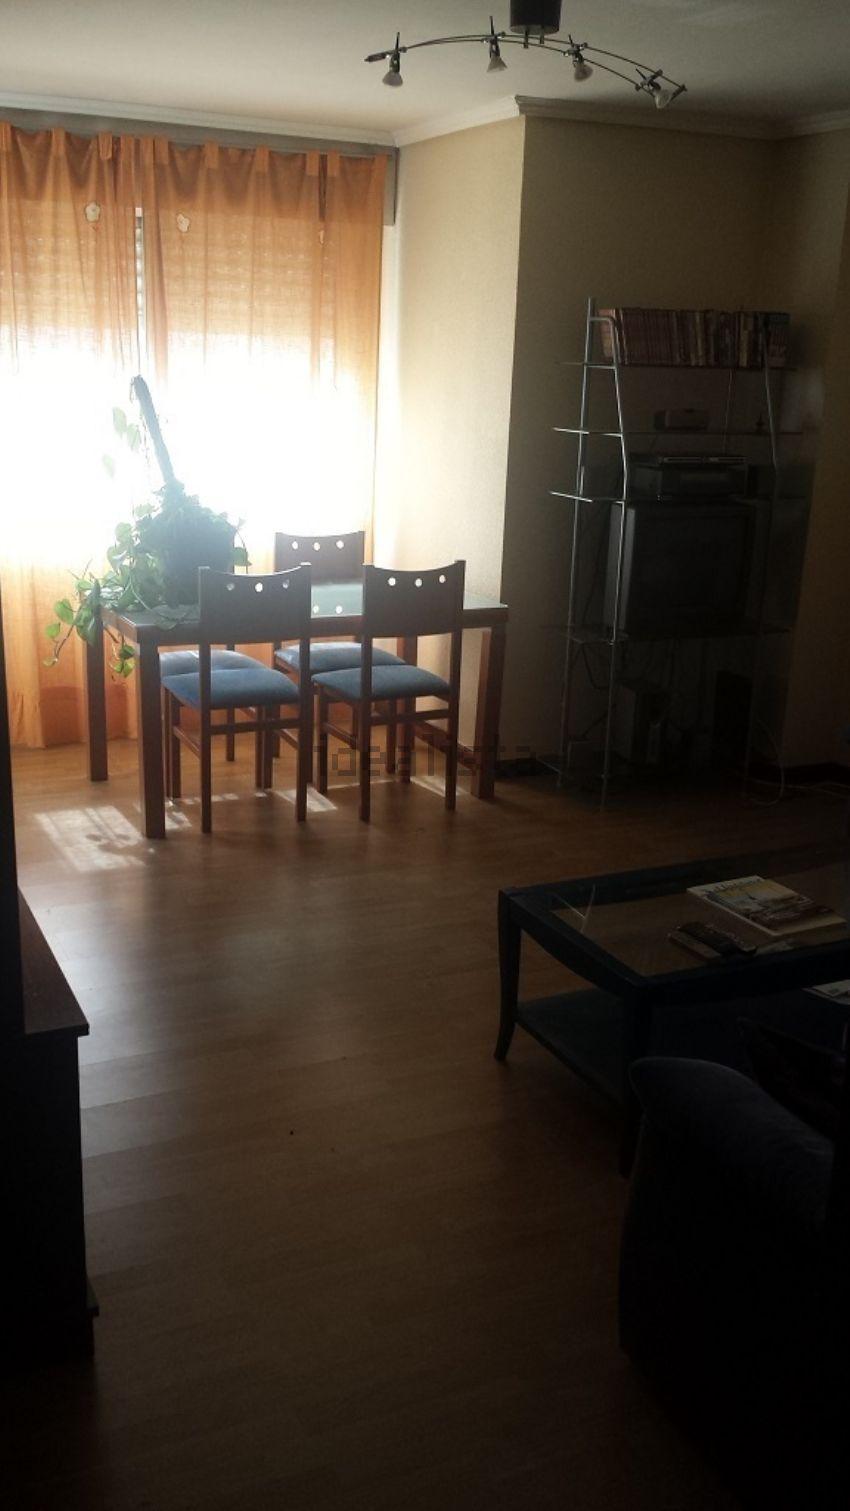 Piso en calle peña trevinca, 23, Hiniesta - Villapando, Zamora